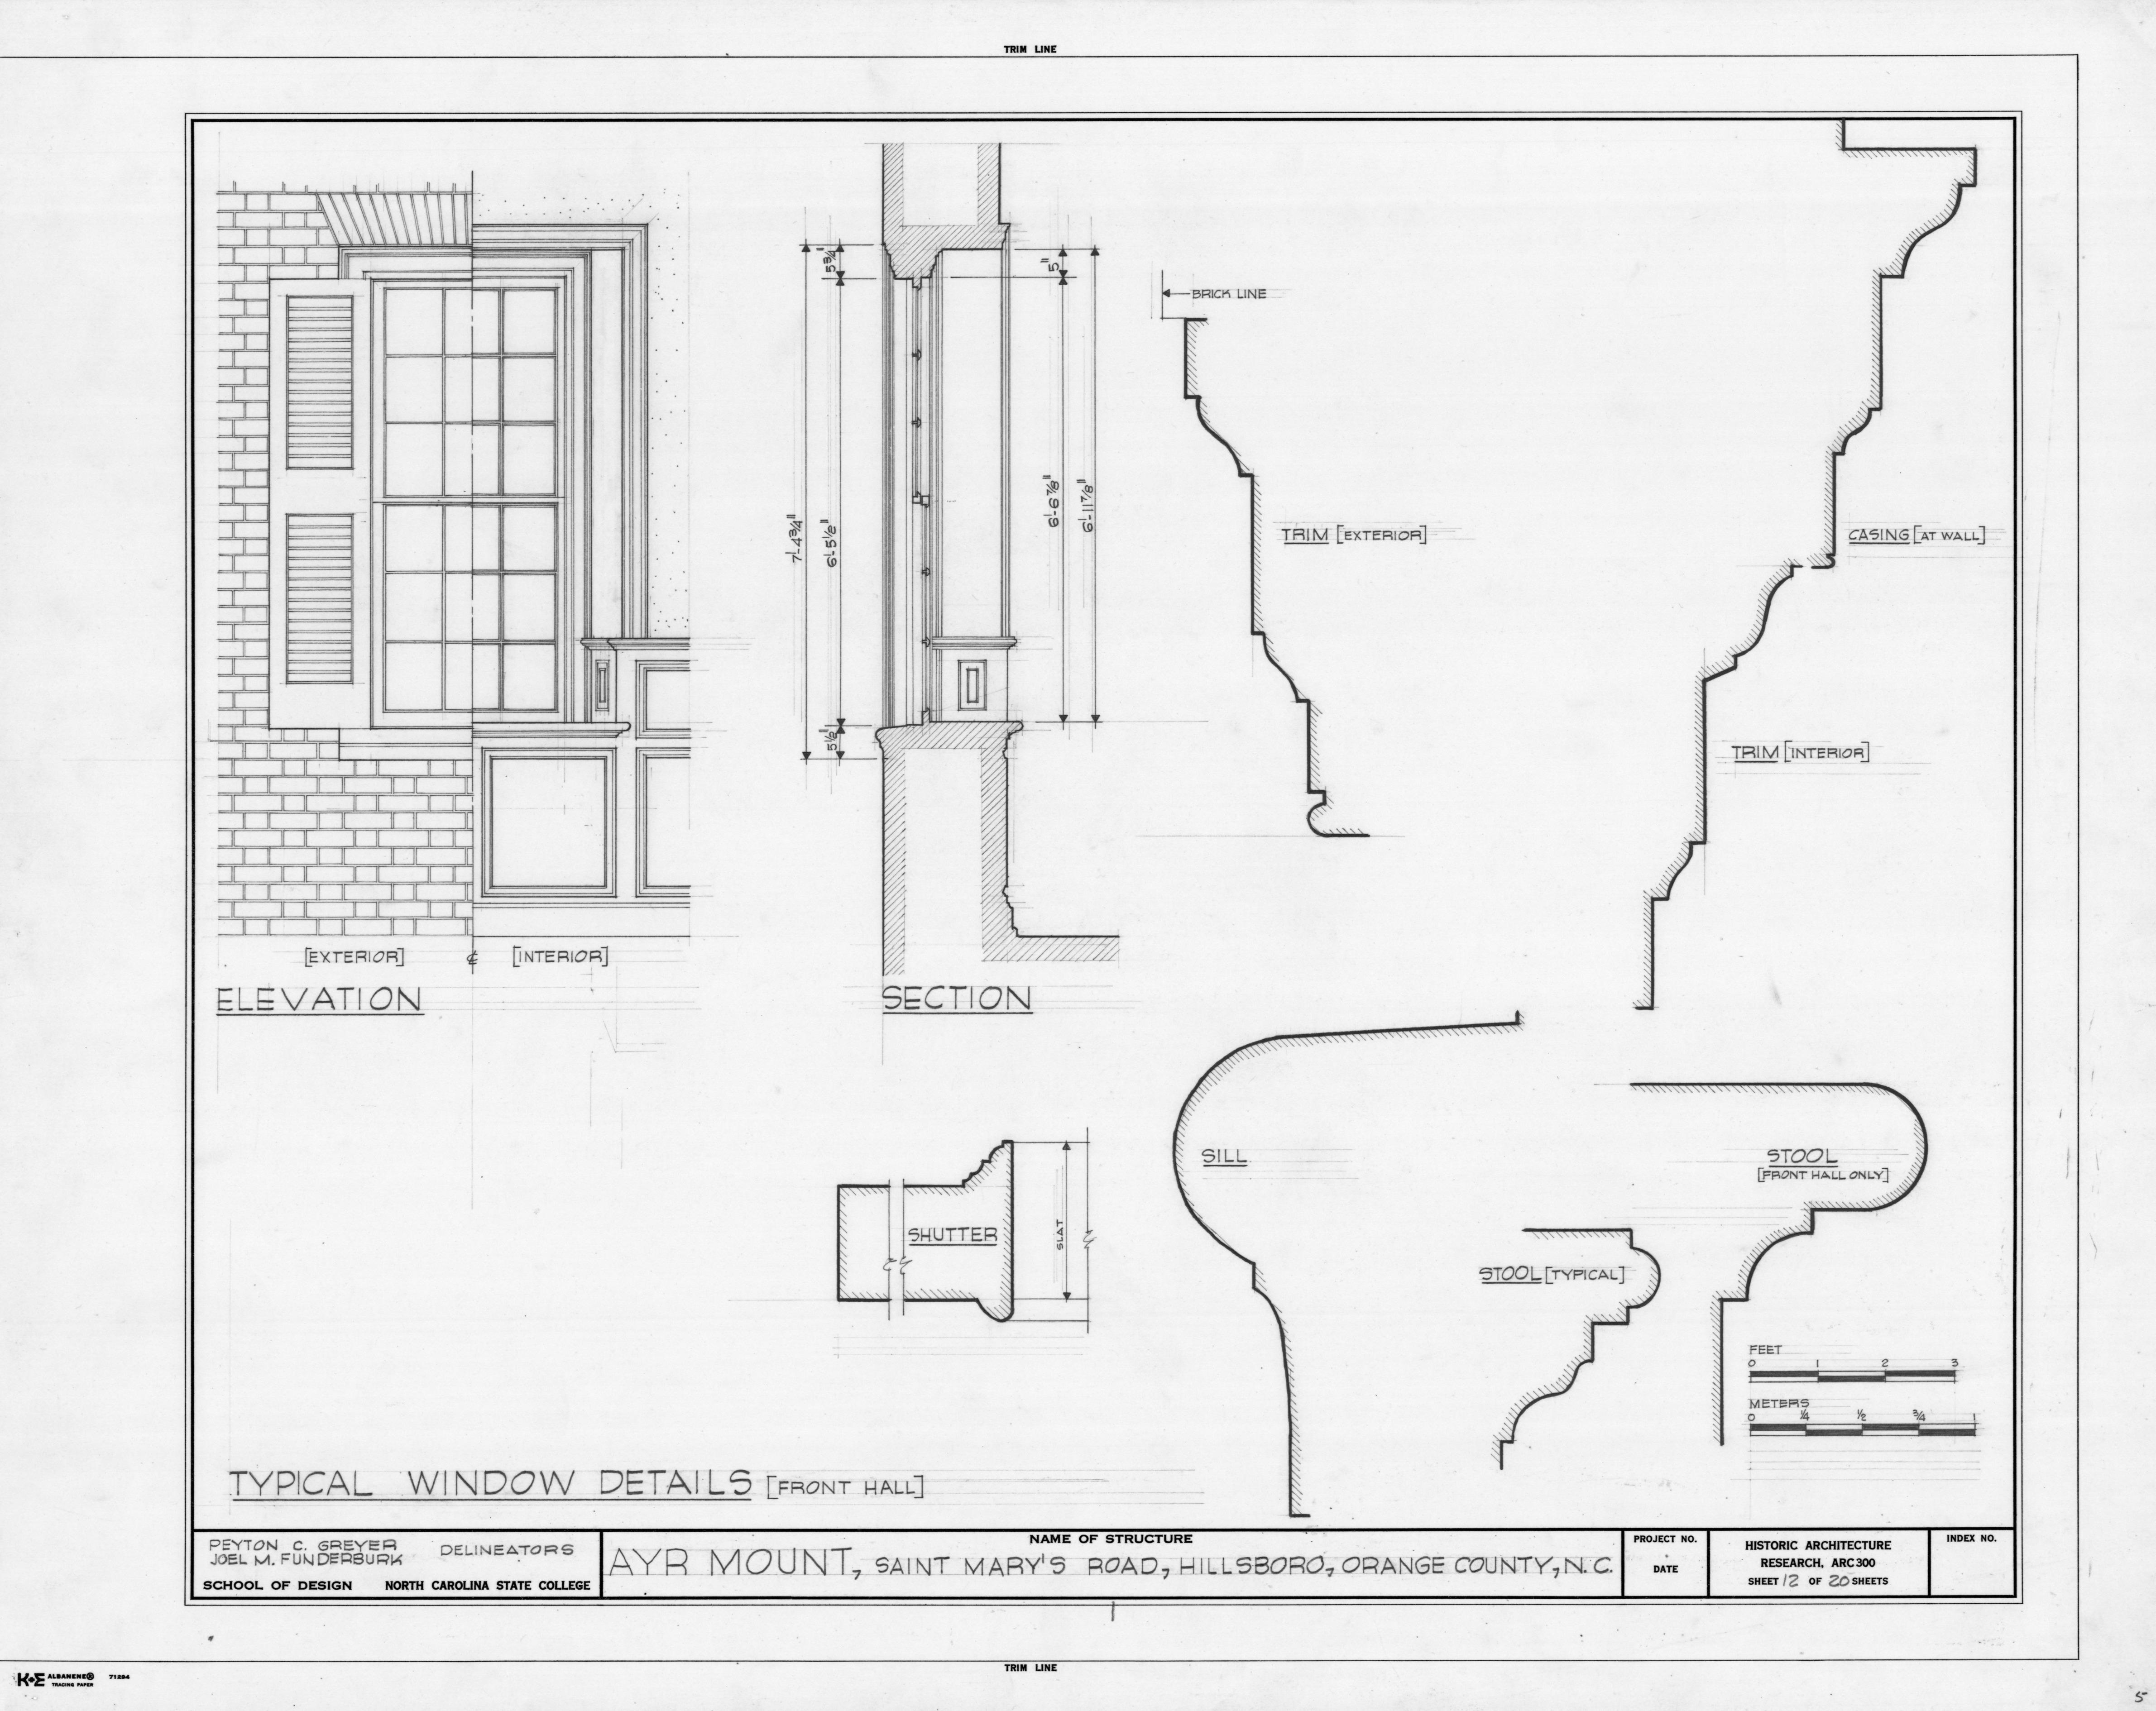 Window details ayr mount hillsborough north carolina for Bay window plan detail